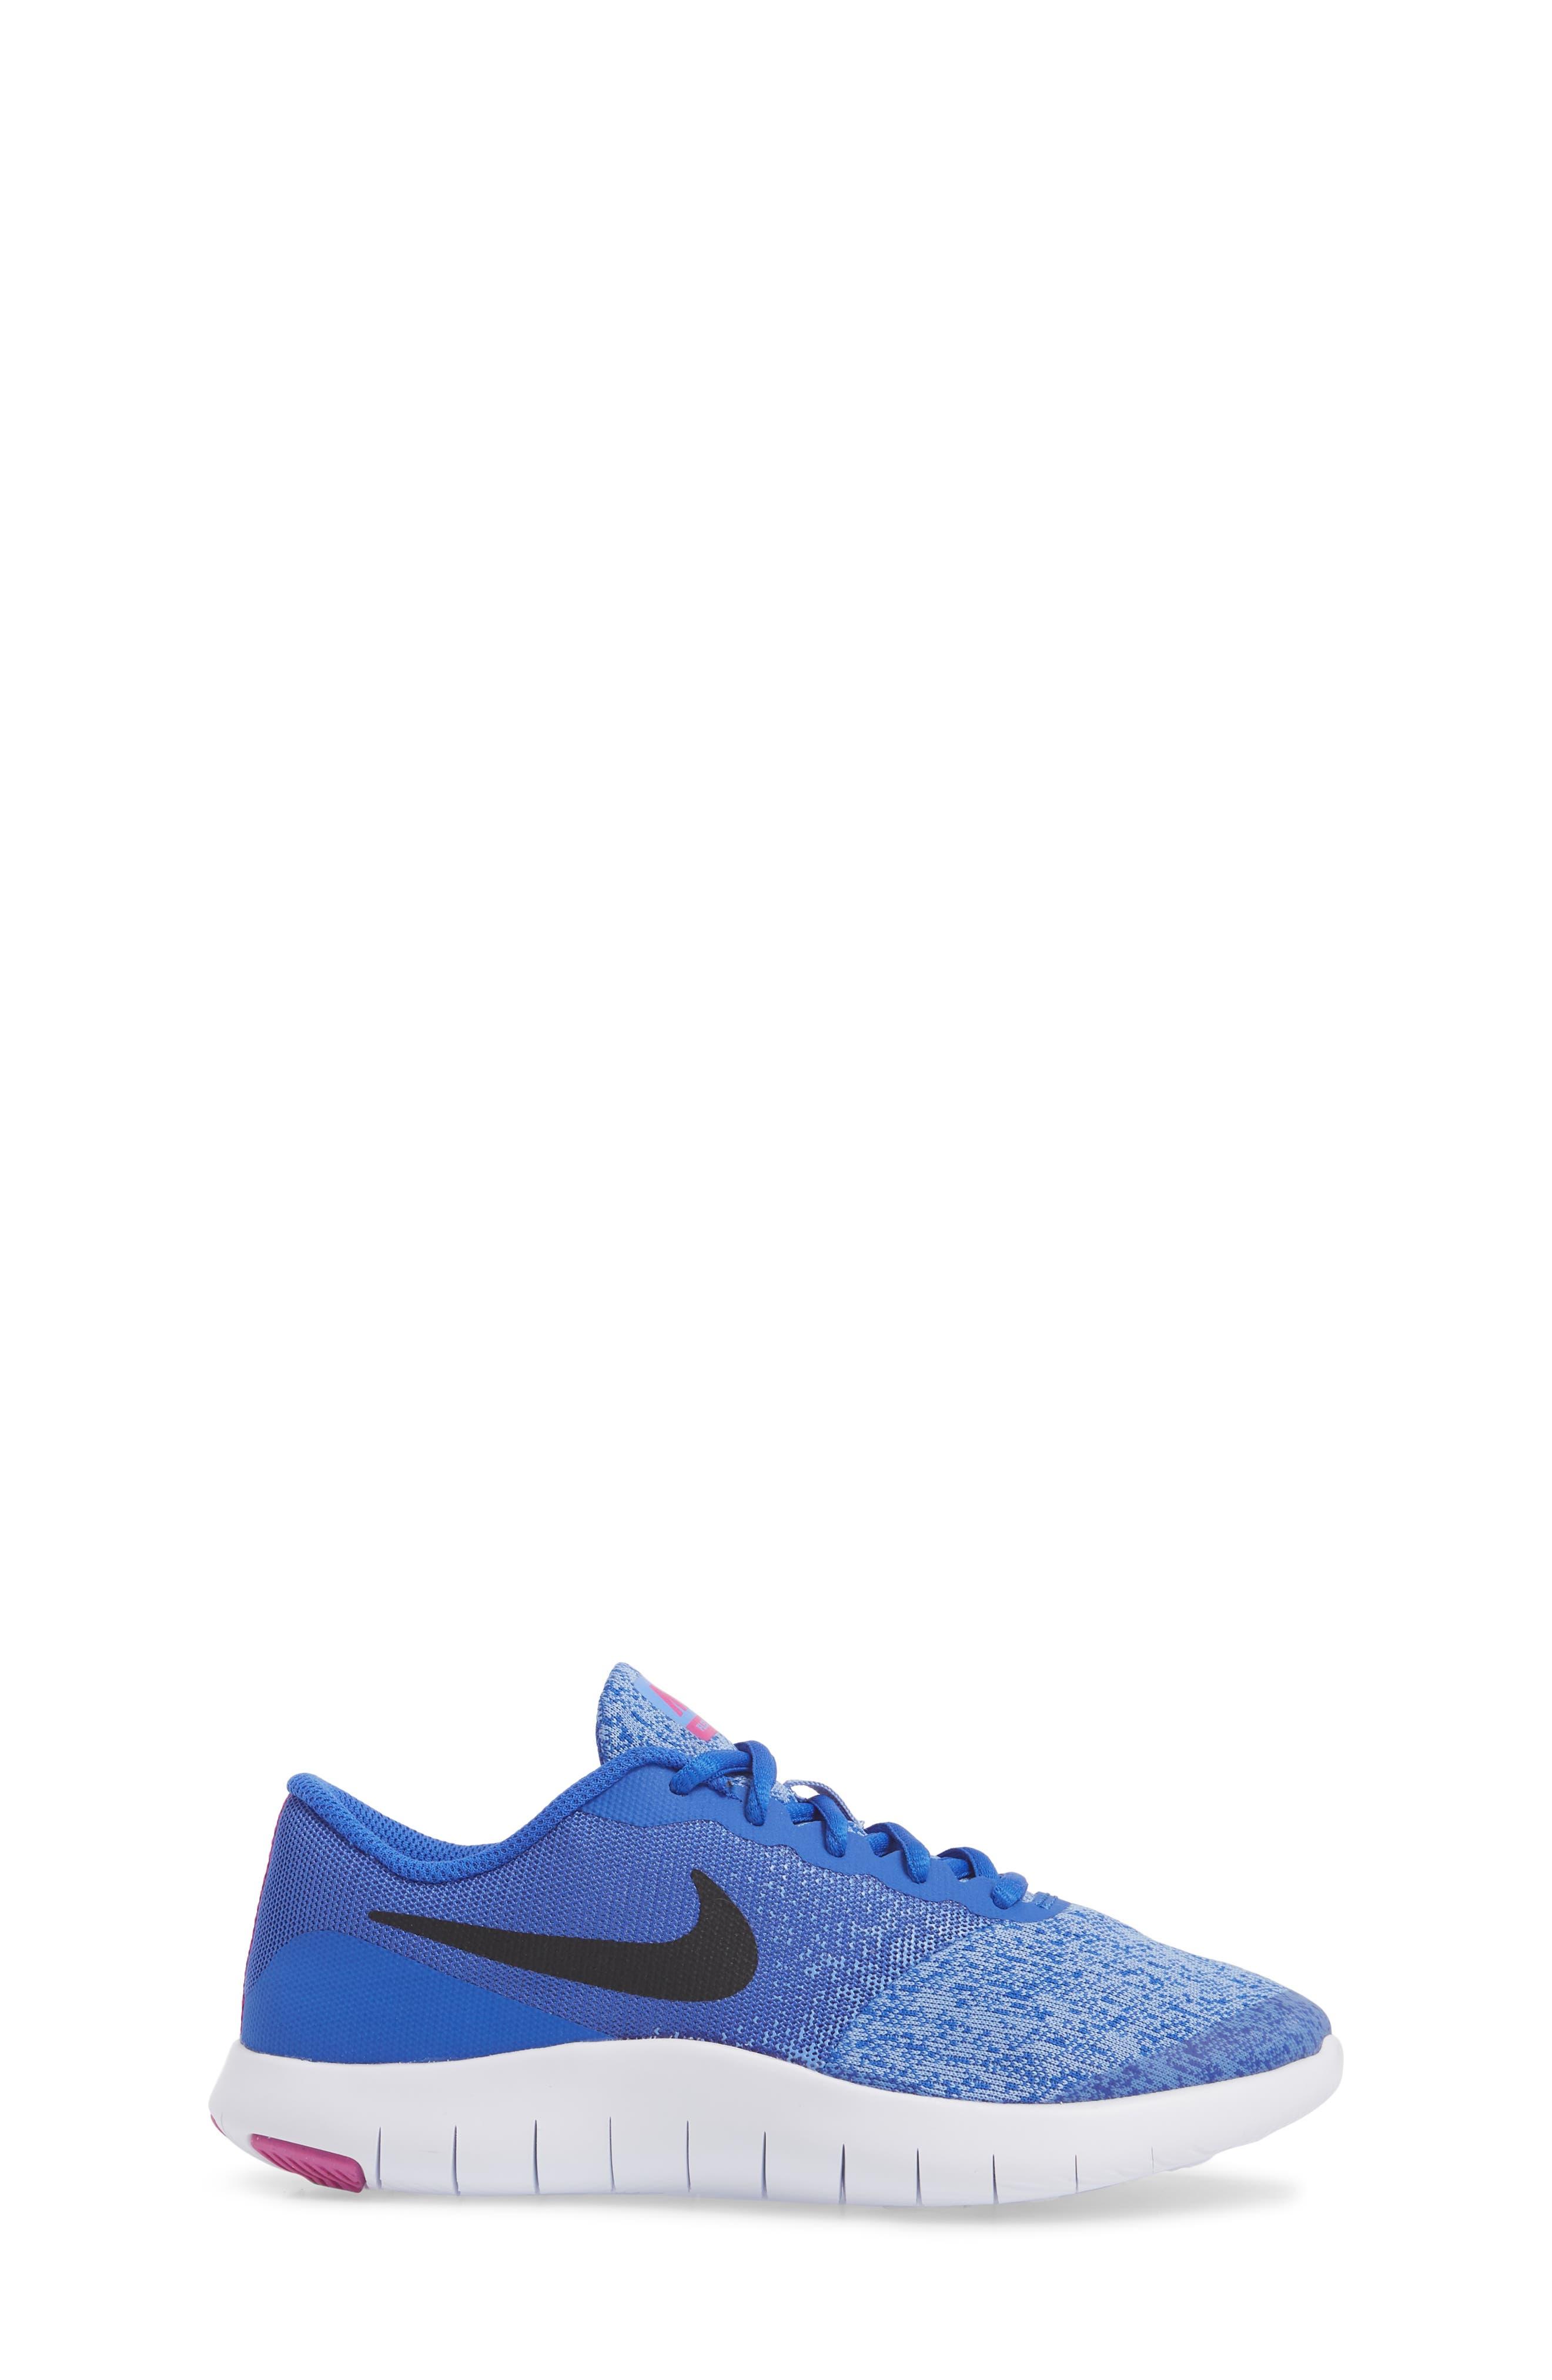 Flex Contact Running Shoe,                             Alternate thumbnail 14, color,